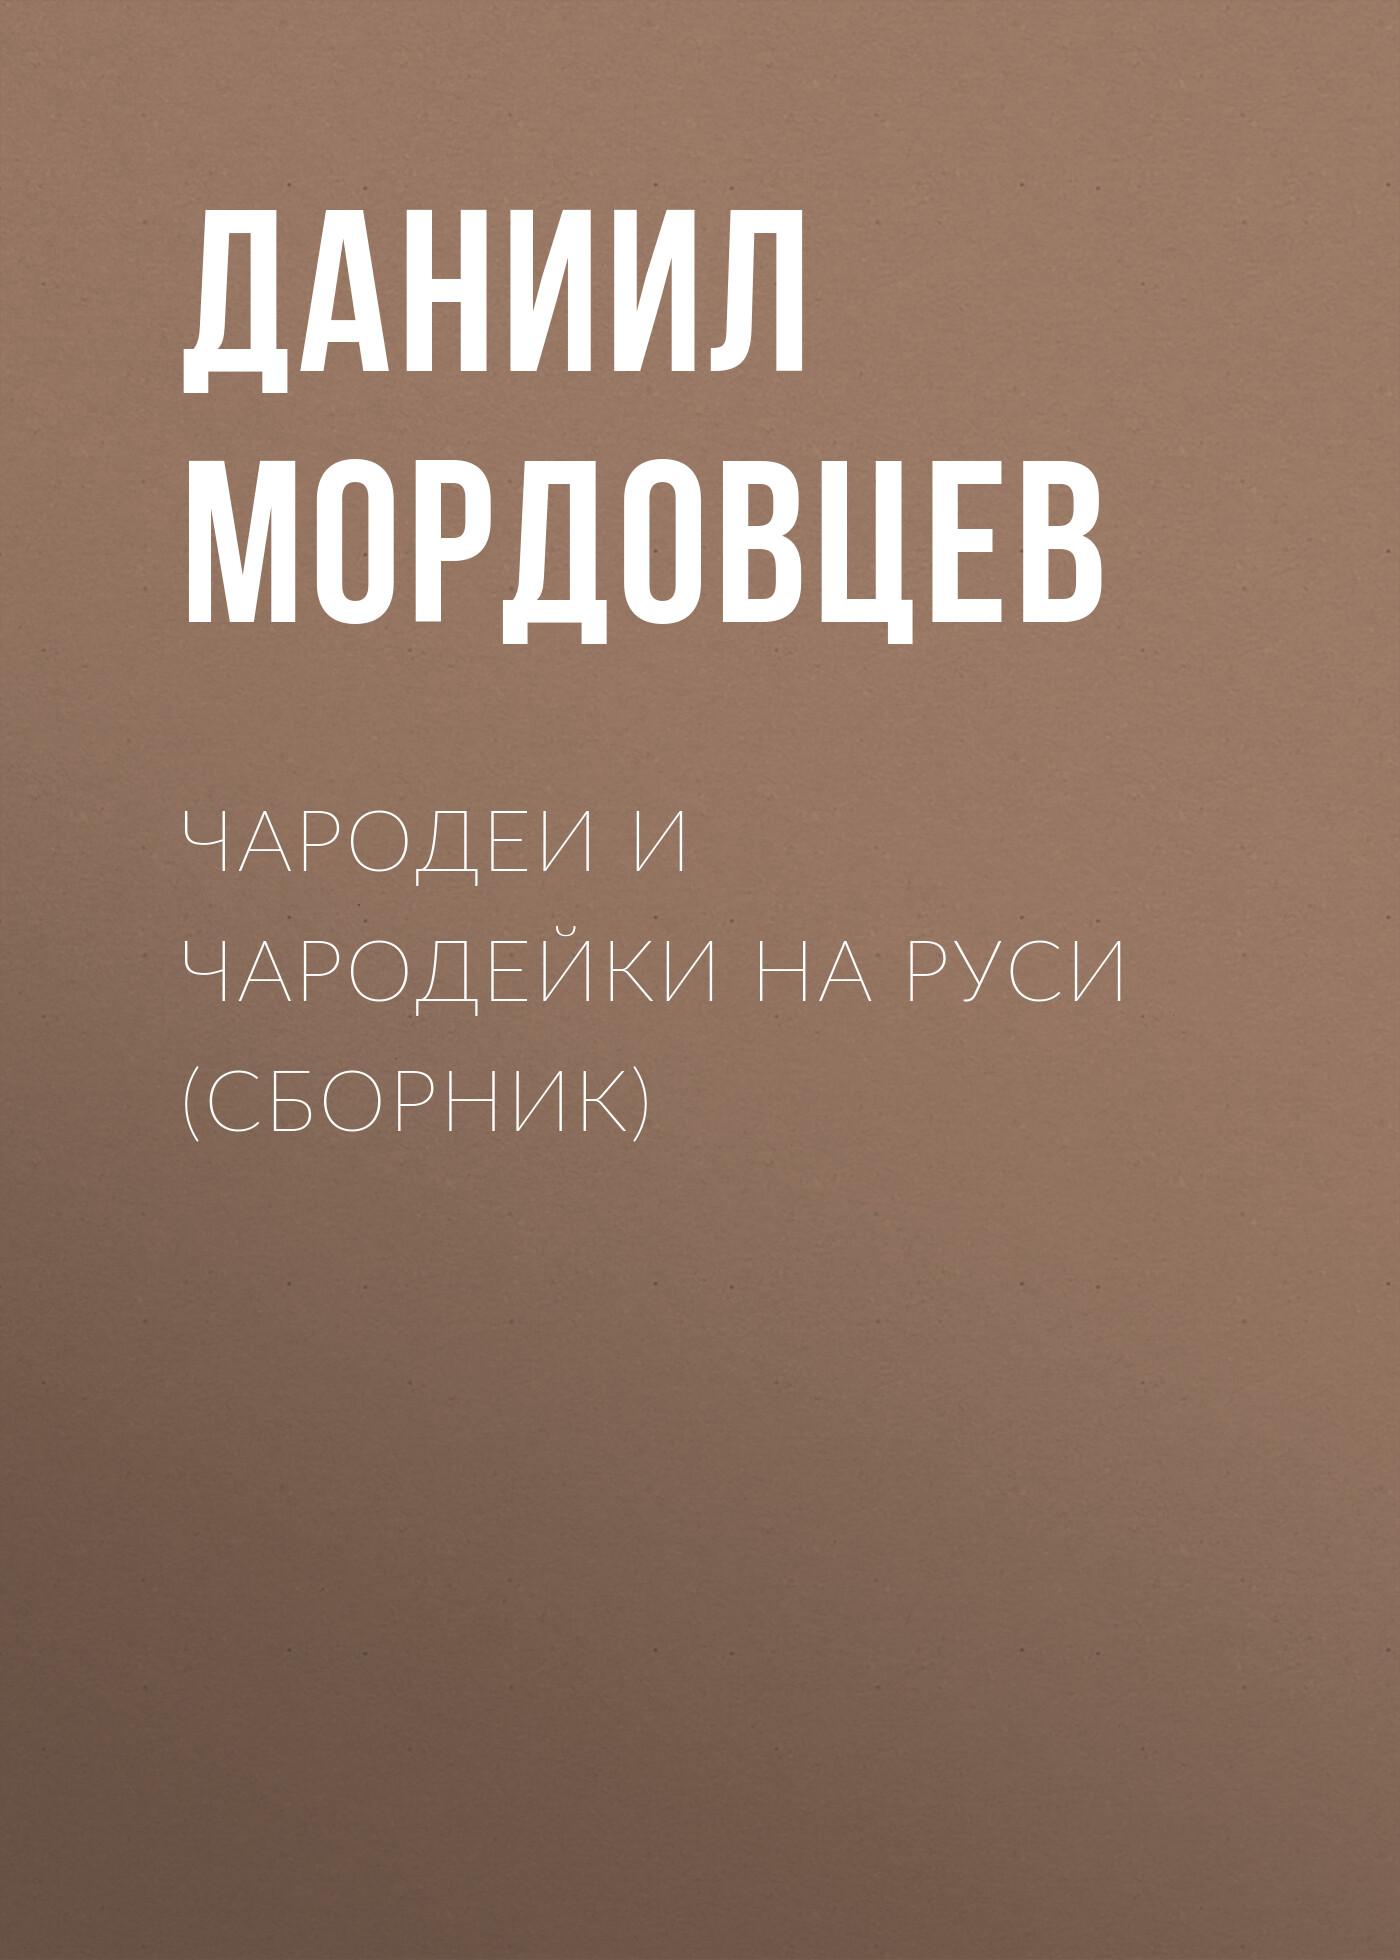 Даниил Мордовцев Чародеи и чародейки на Руси (сборник) даниил мордовцев державный плотник